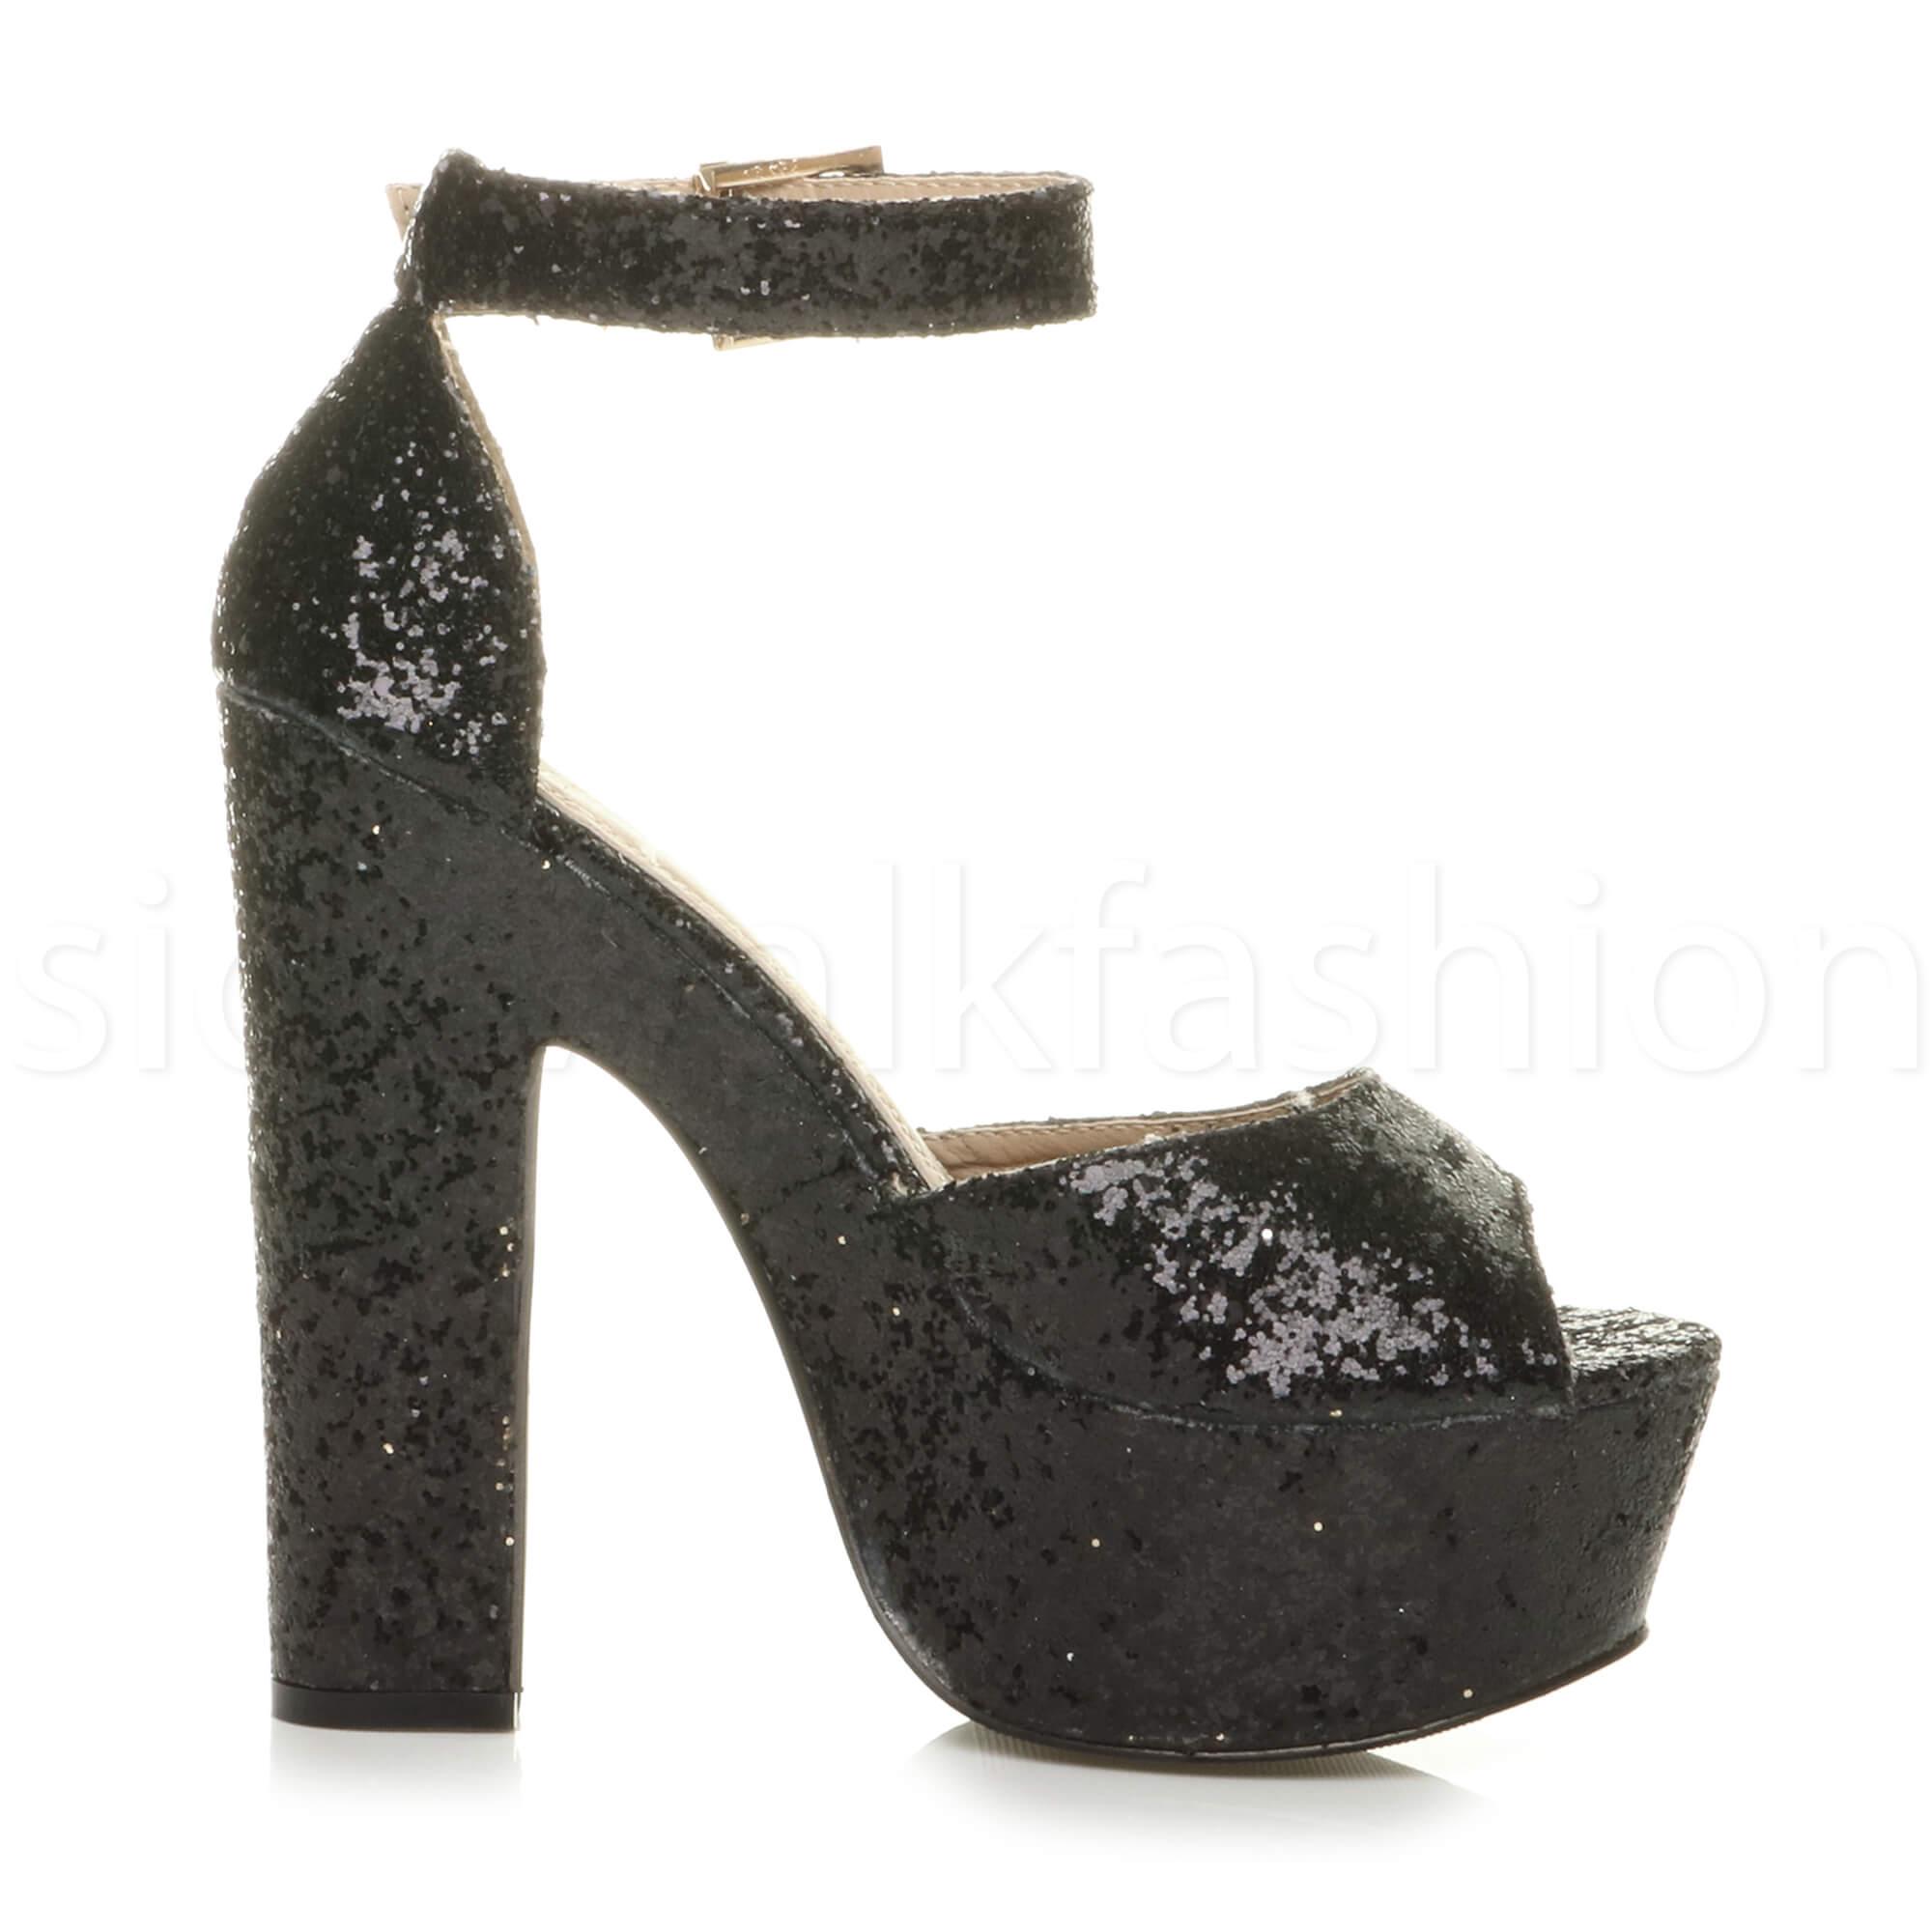 Womens-ladies-high-block-heel-peep-toe-shoes-evening-party-platform-sandals-size thumbnail 4